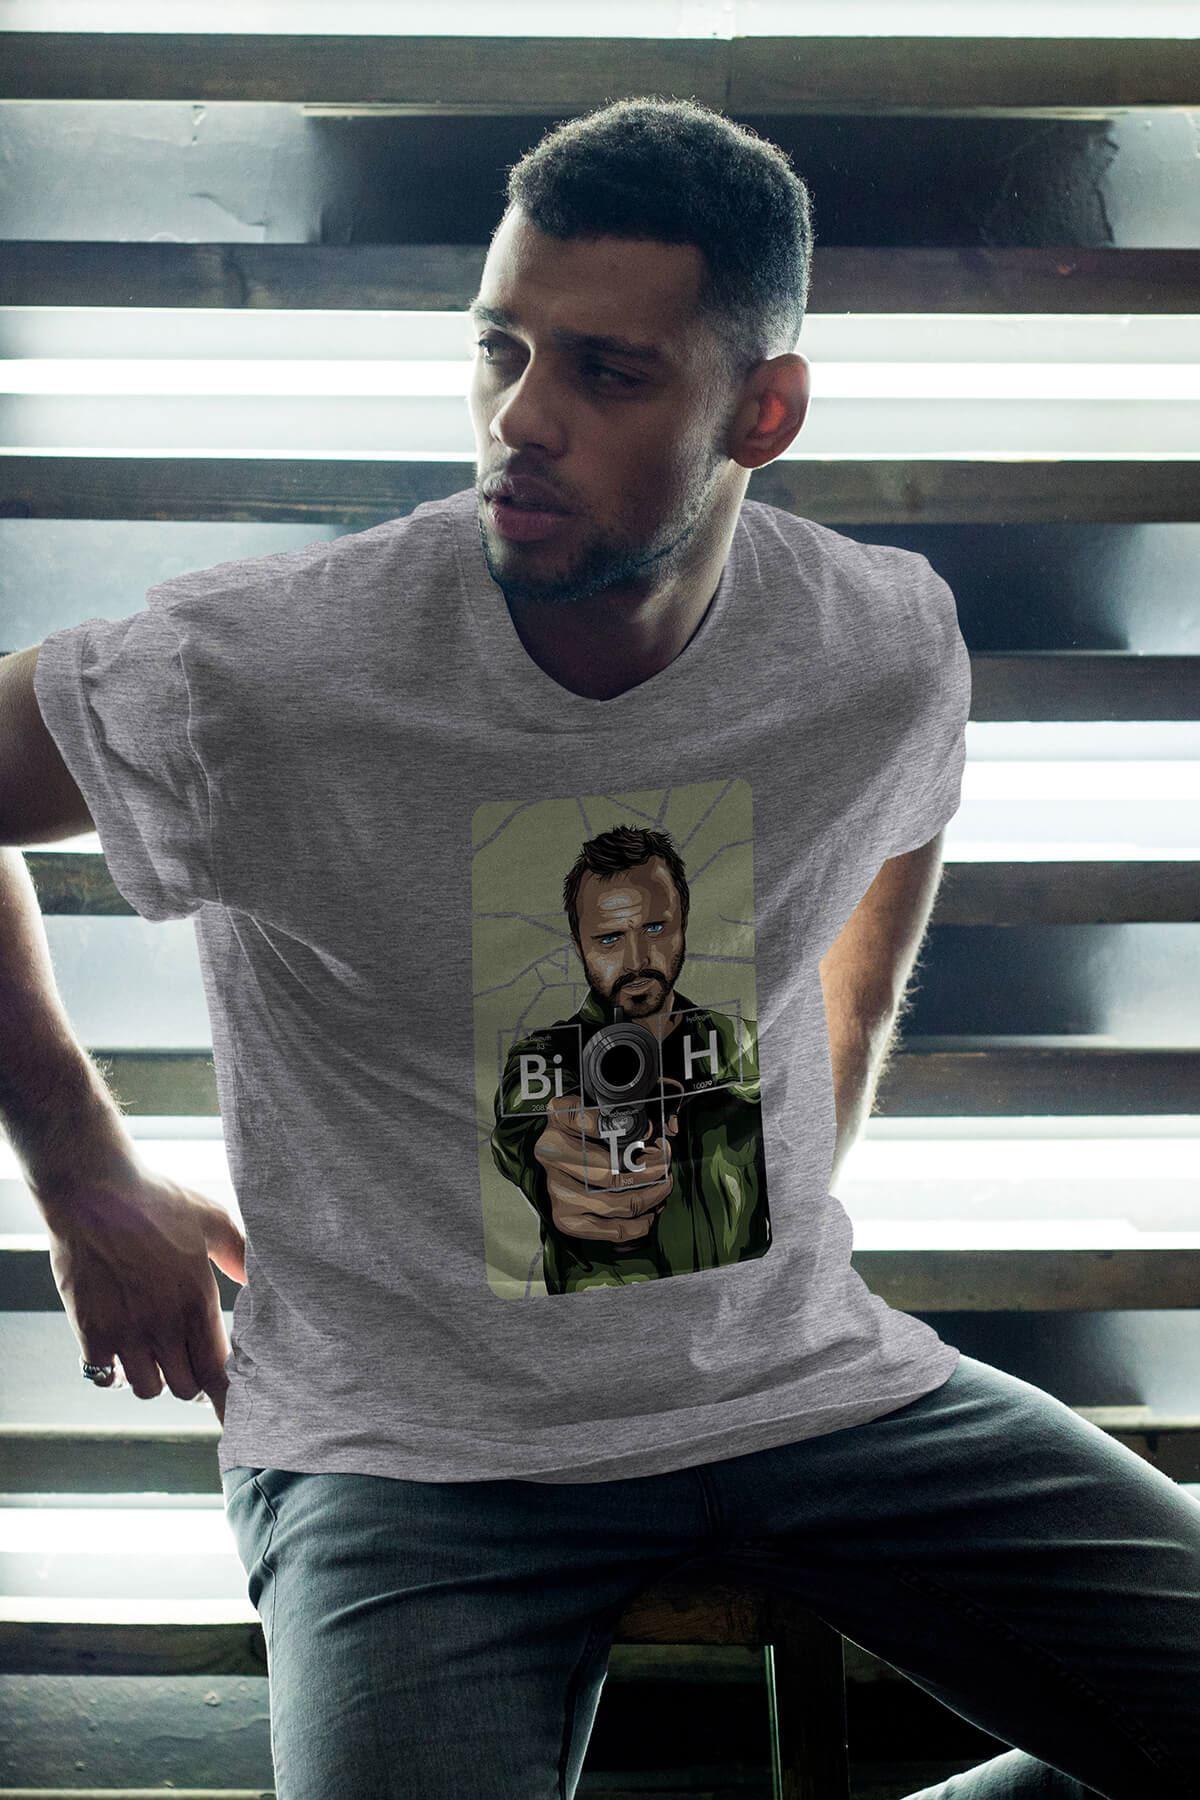 Breaking Bad Jesse Pinkman 17 Gri Erkek Oversize Tshirt - Tişört